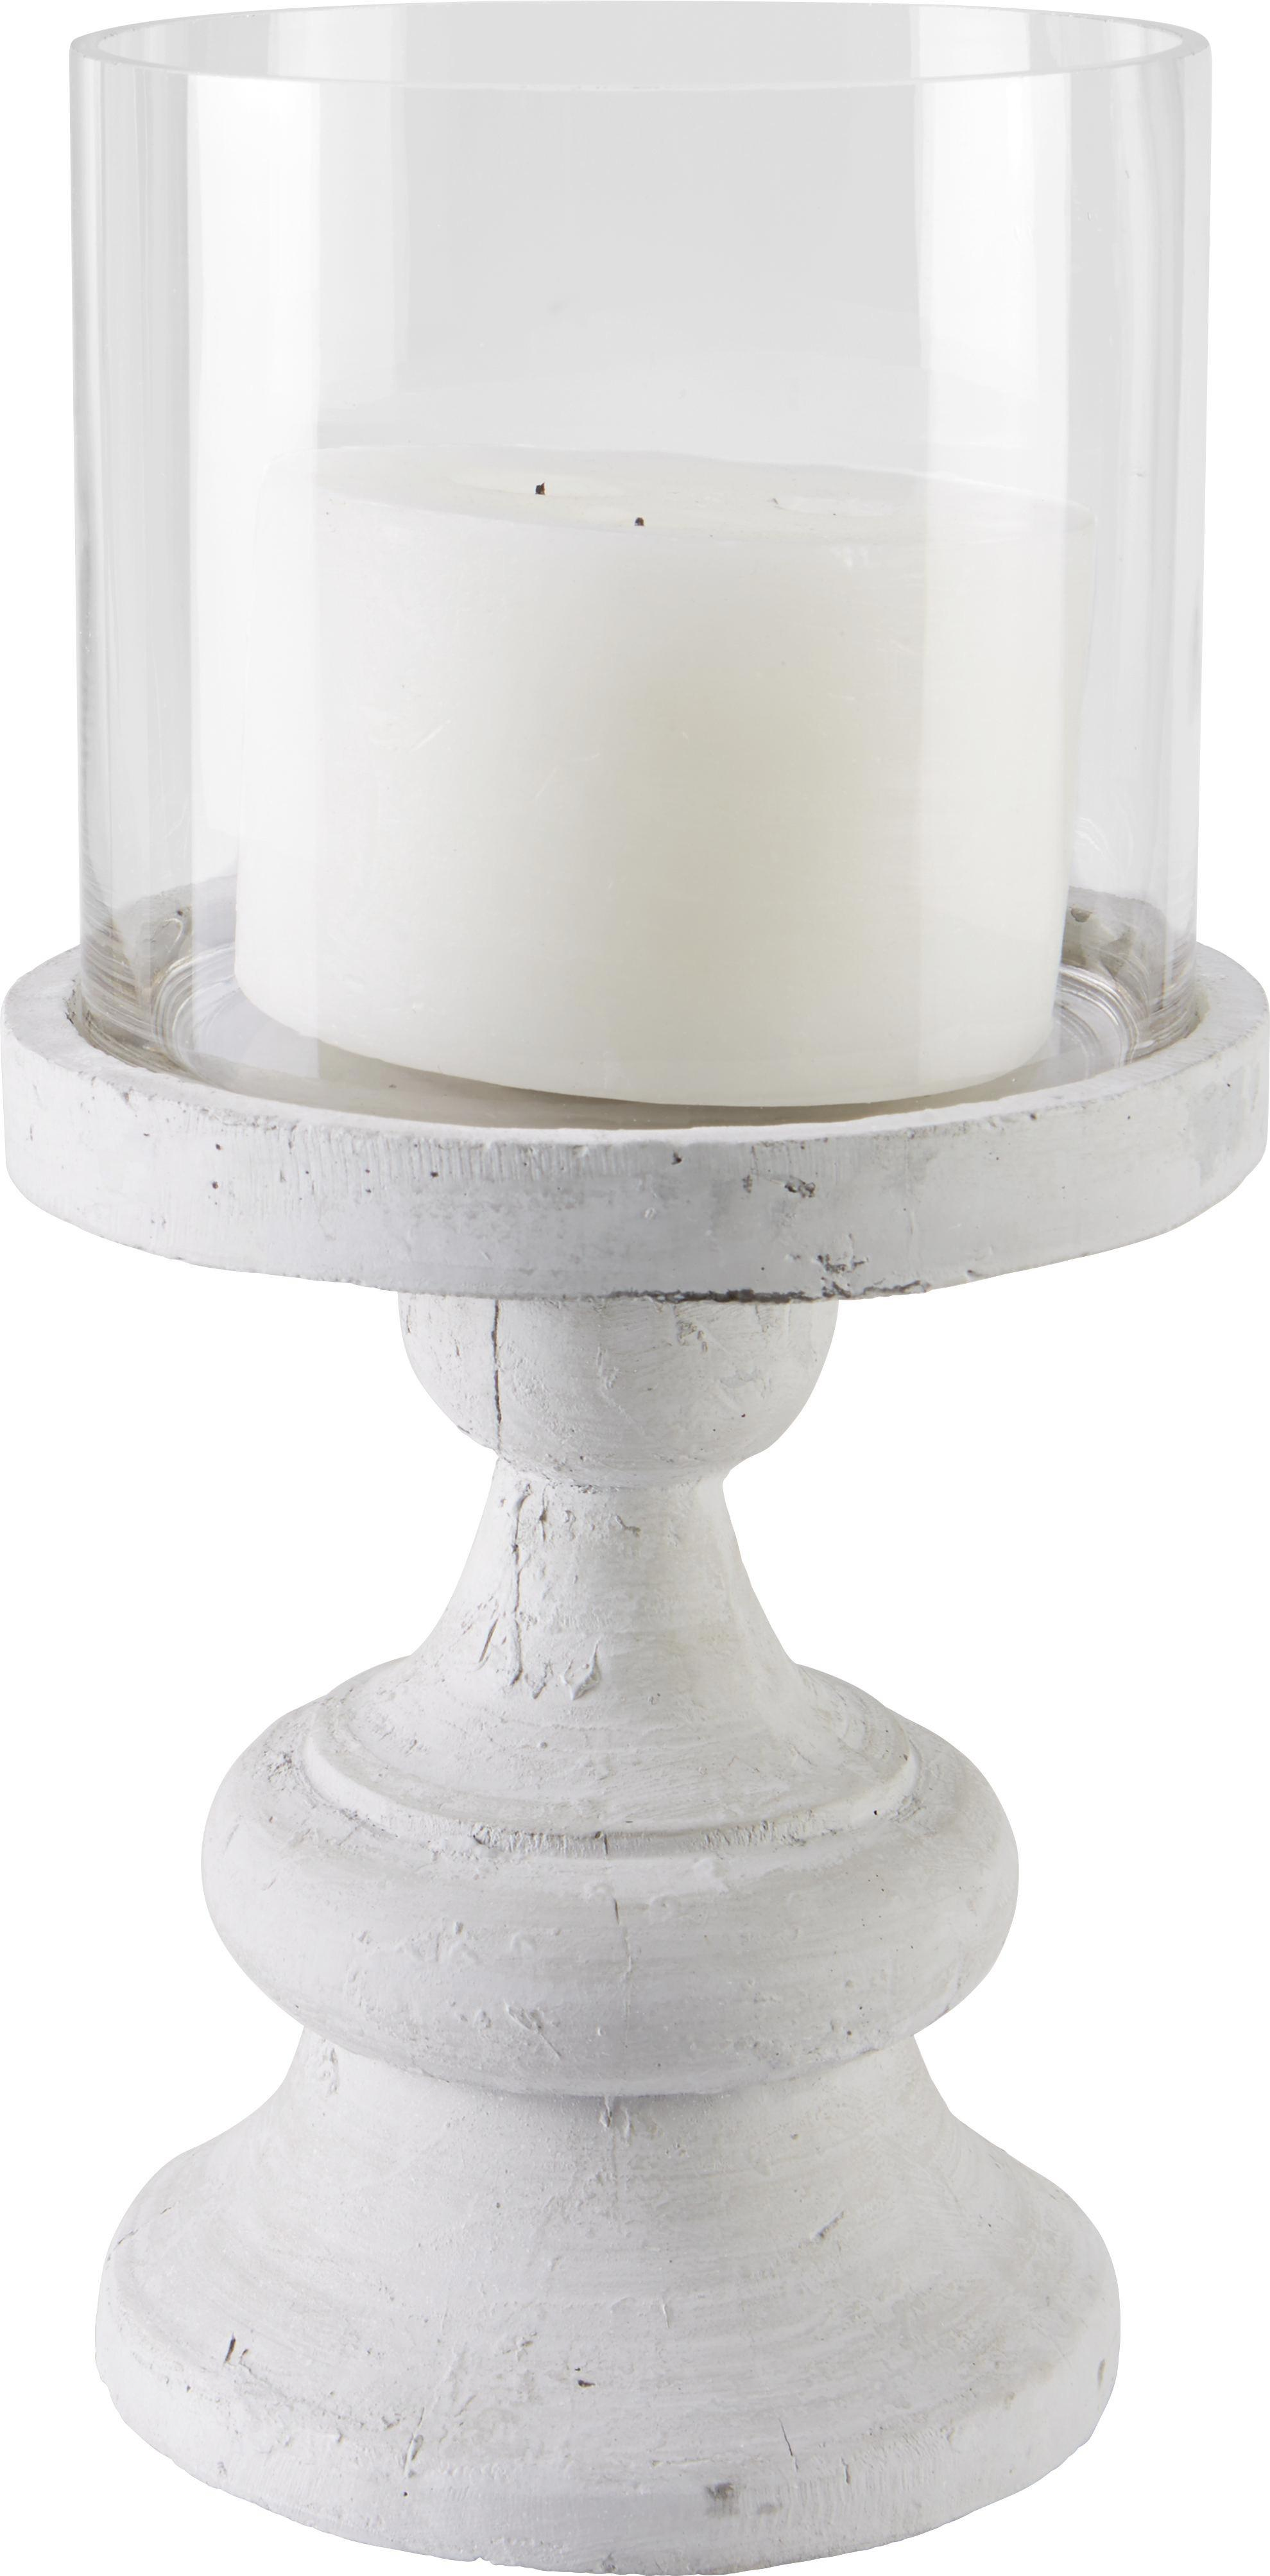 Windlicht Armira inkl. Glas - Klar/Grau, MODERN, Glas/Metall (22,50/44cm) - MÖMAX modern living